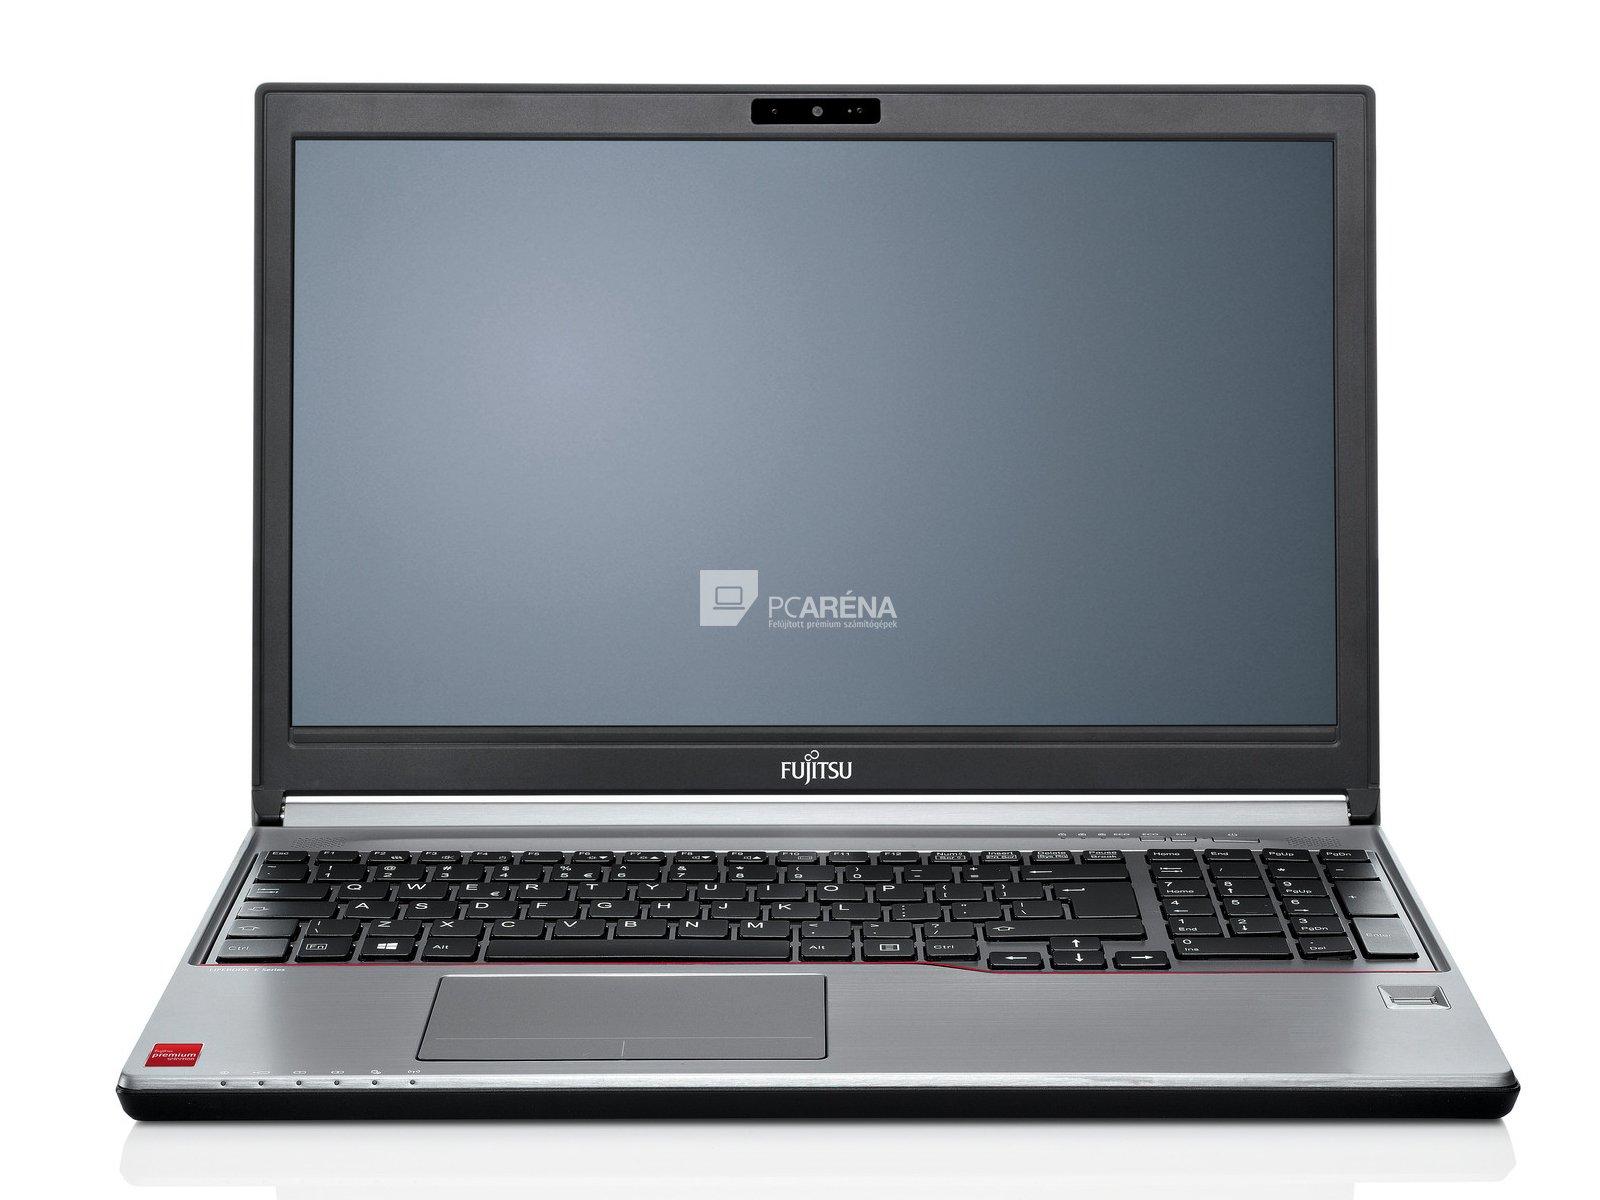 Fujitsu LifeBook E754 laptop